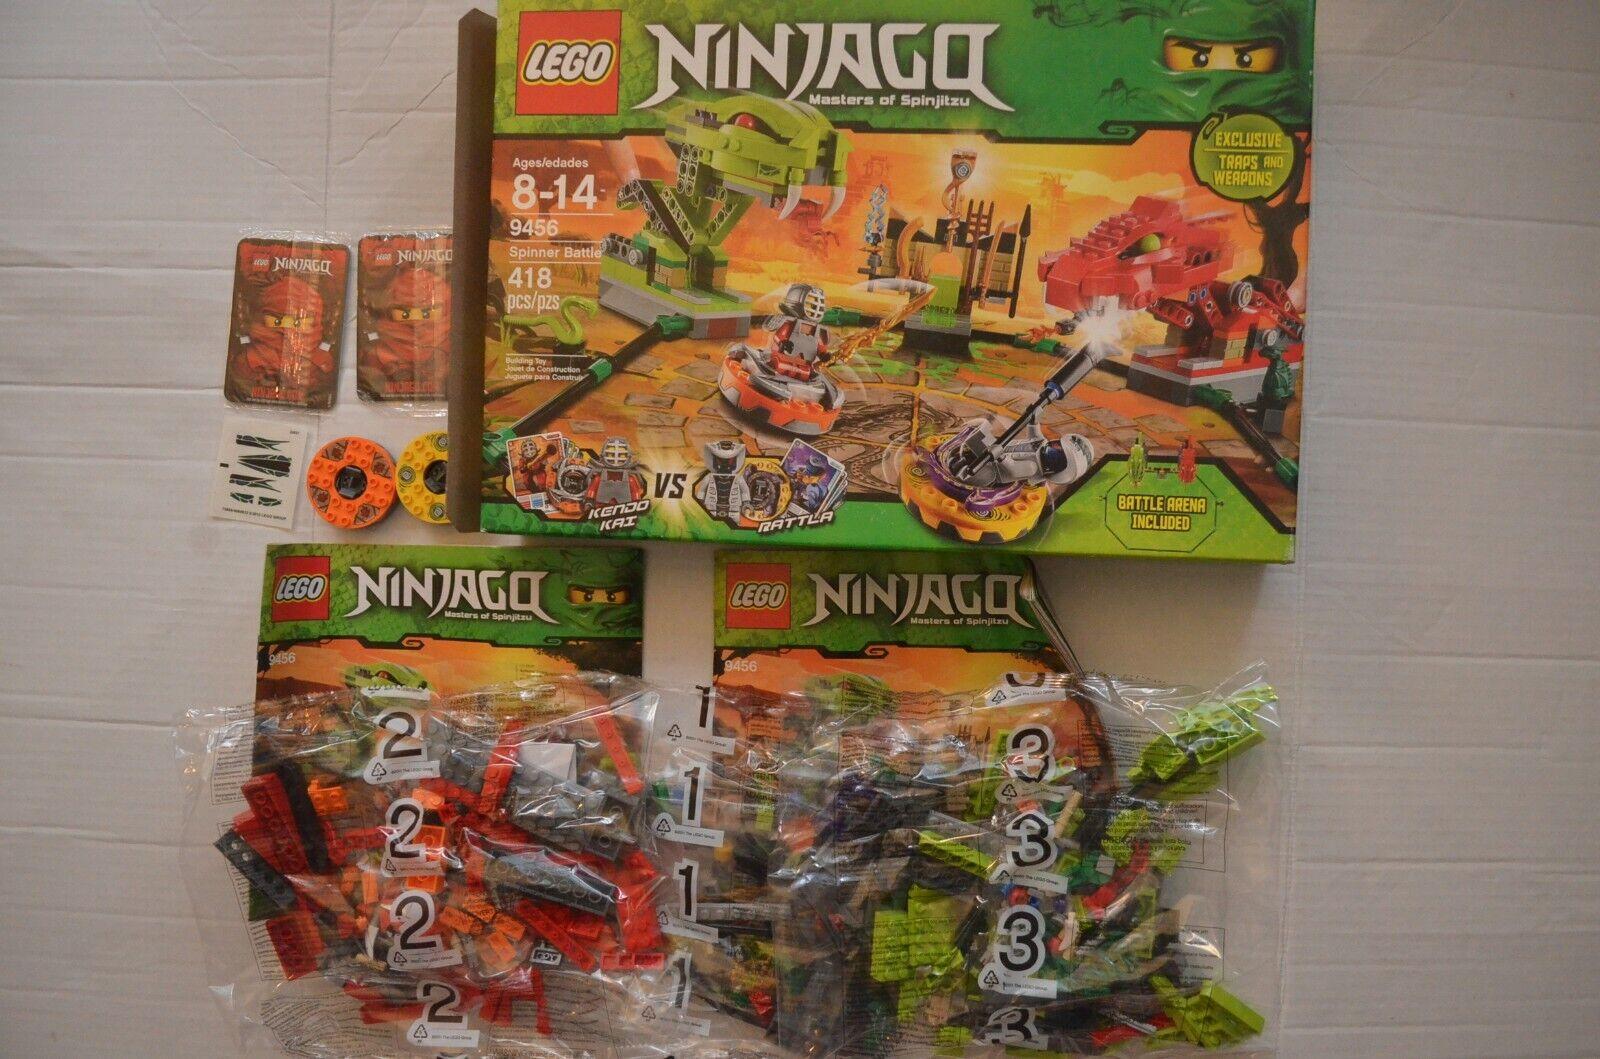 LEGO Ninjago Exclusive Set Spinner slåss Arena (NY IN ÖPPEN låda)